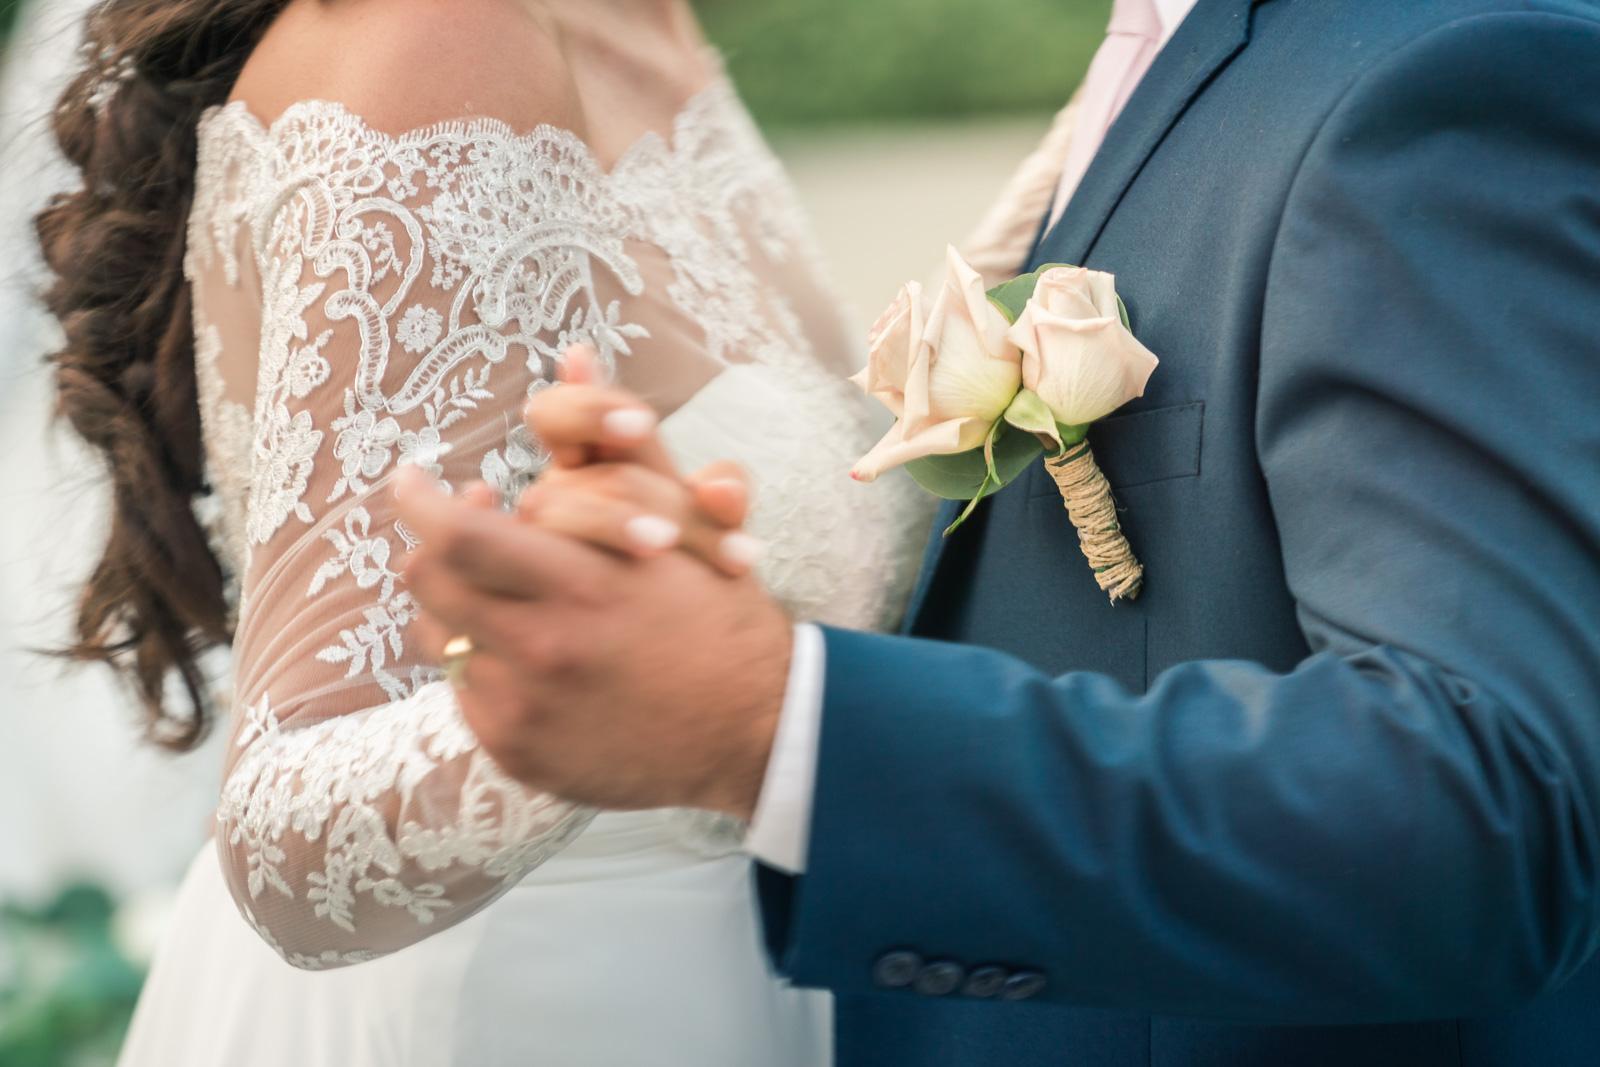 346_Angel-Brea-Orange-County_Joseph-Barber-Wedding-Photography.jpg